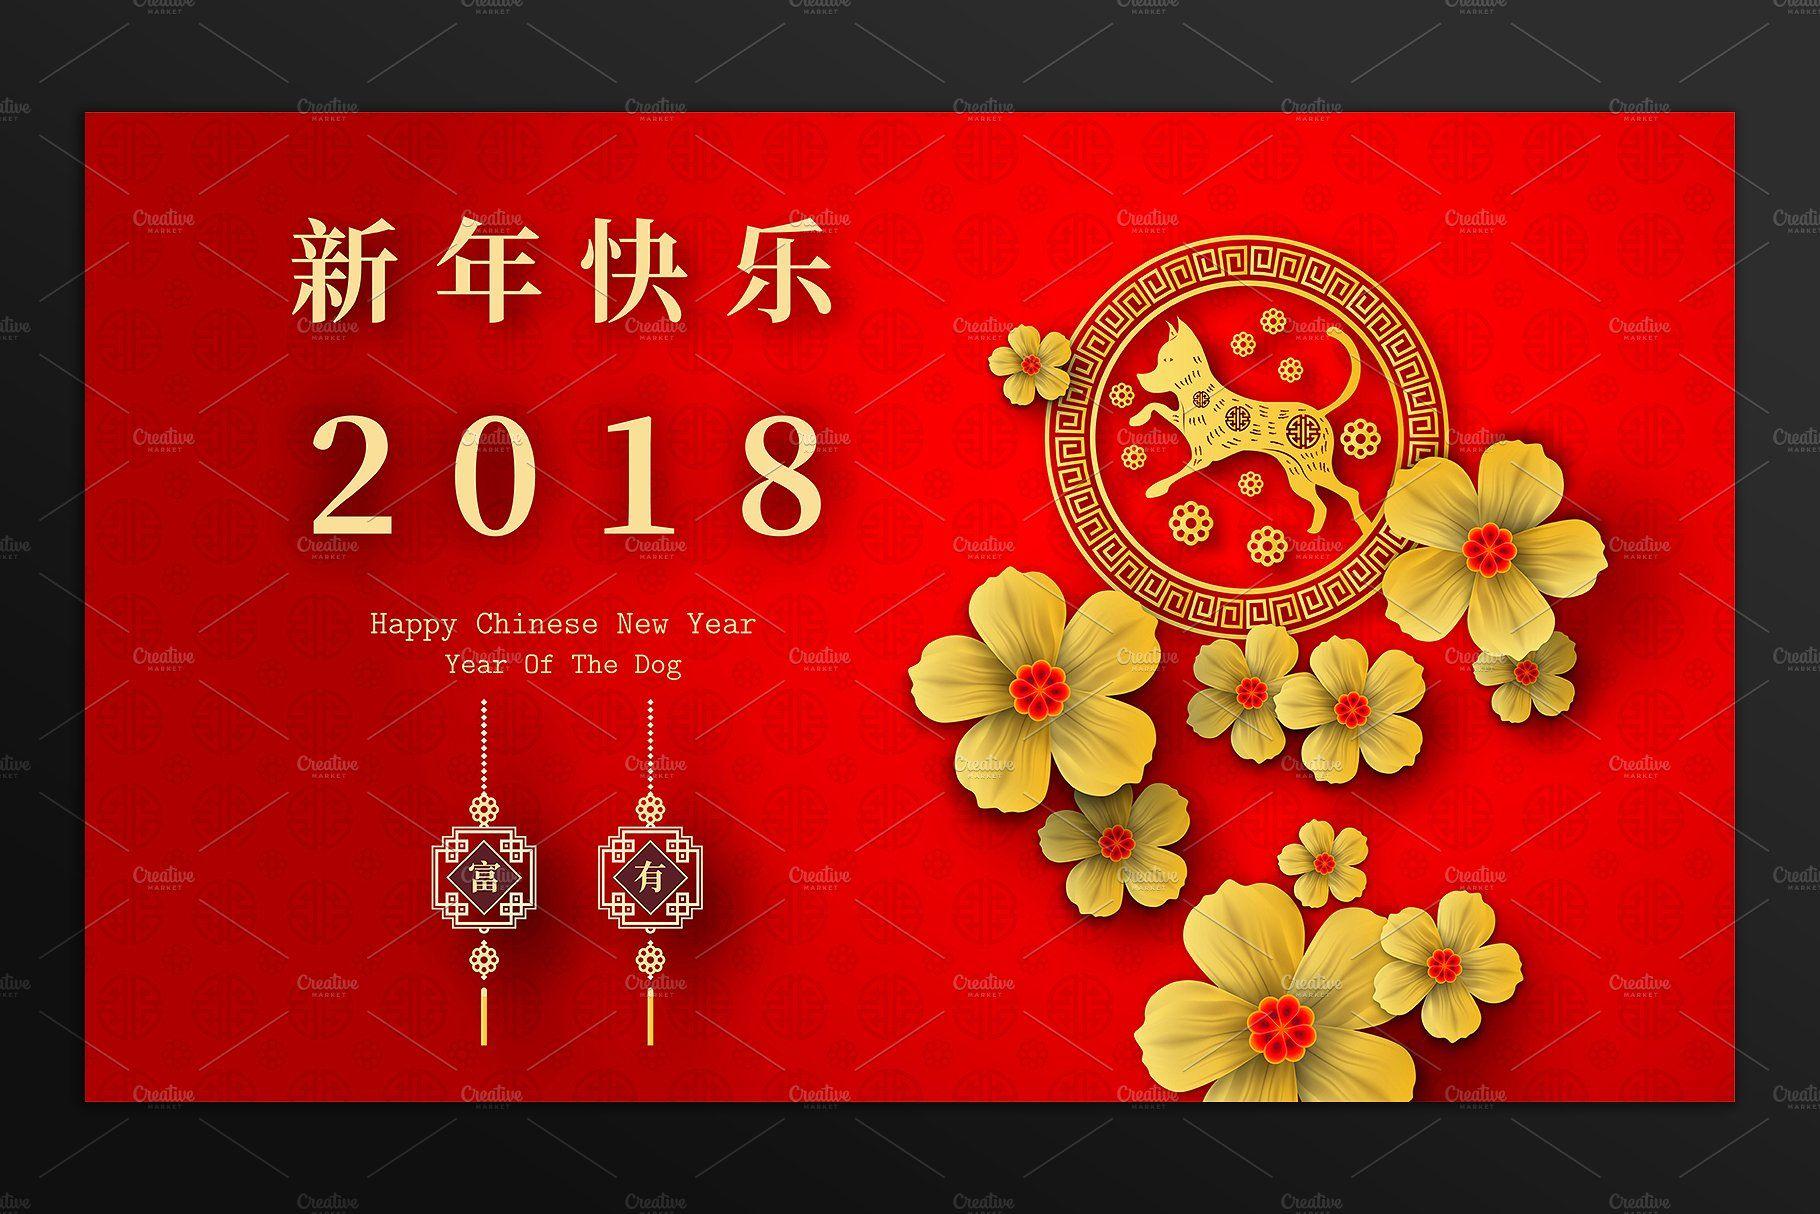 2018 Chinese New Year Card Chinese New Year Card New Year Card Greeting Card Template